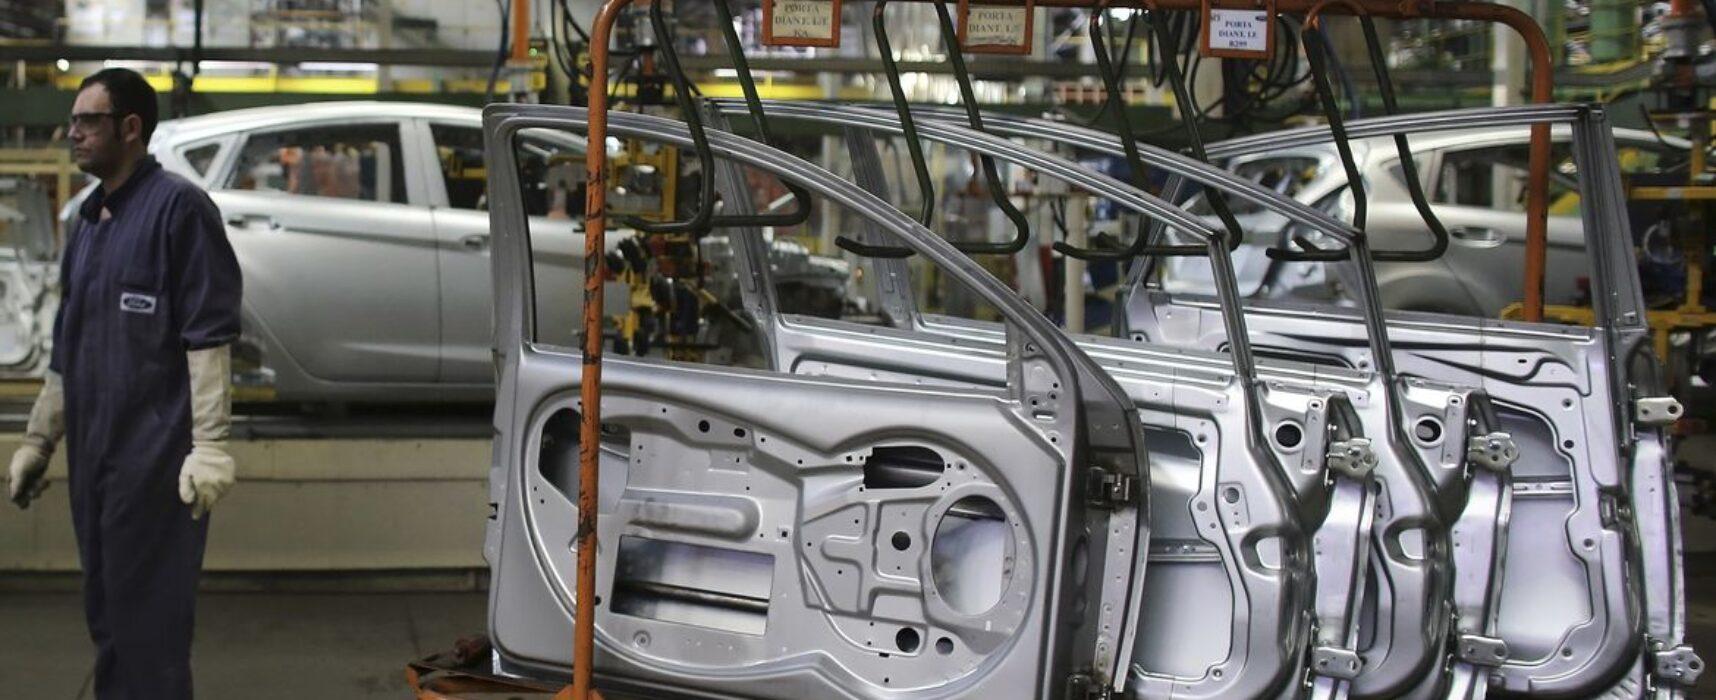 Vendas de veículos caem 10,2%, anuncia Anfavea